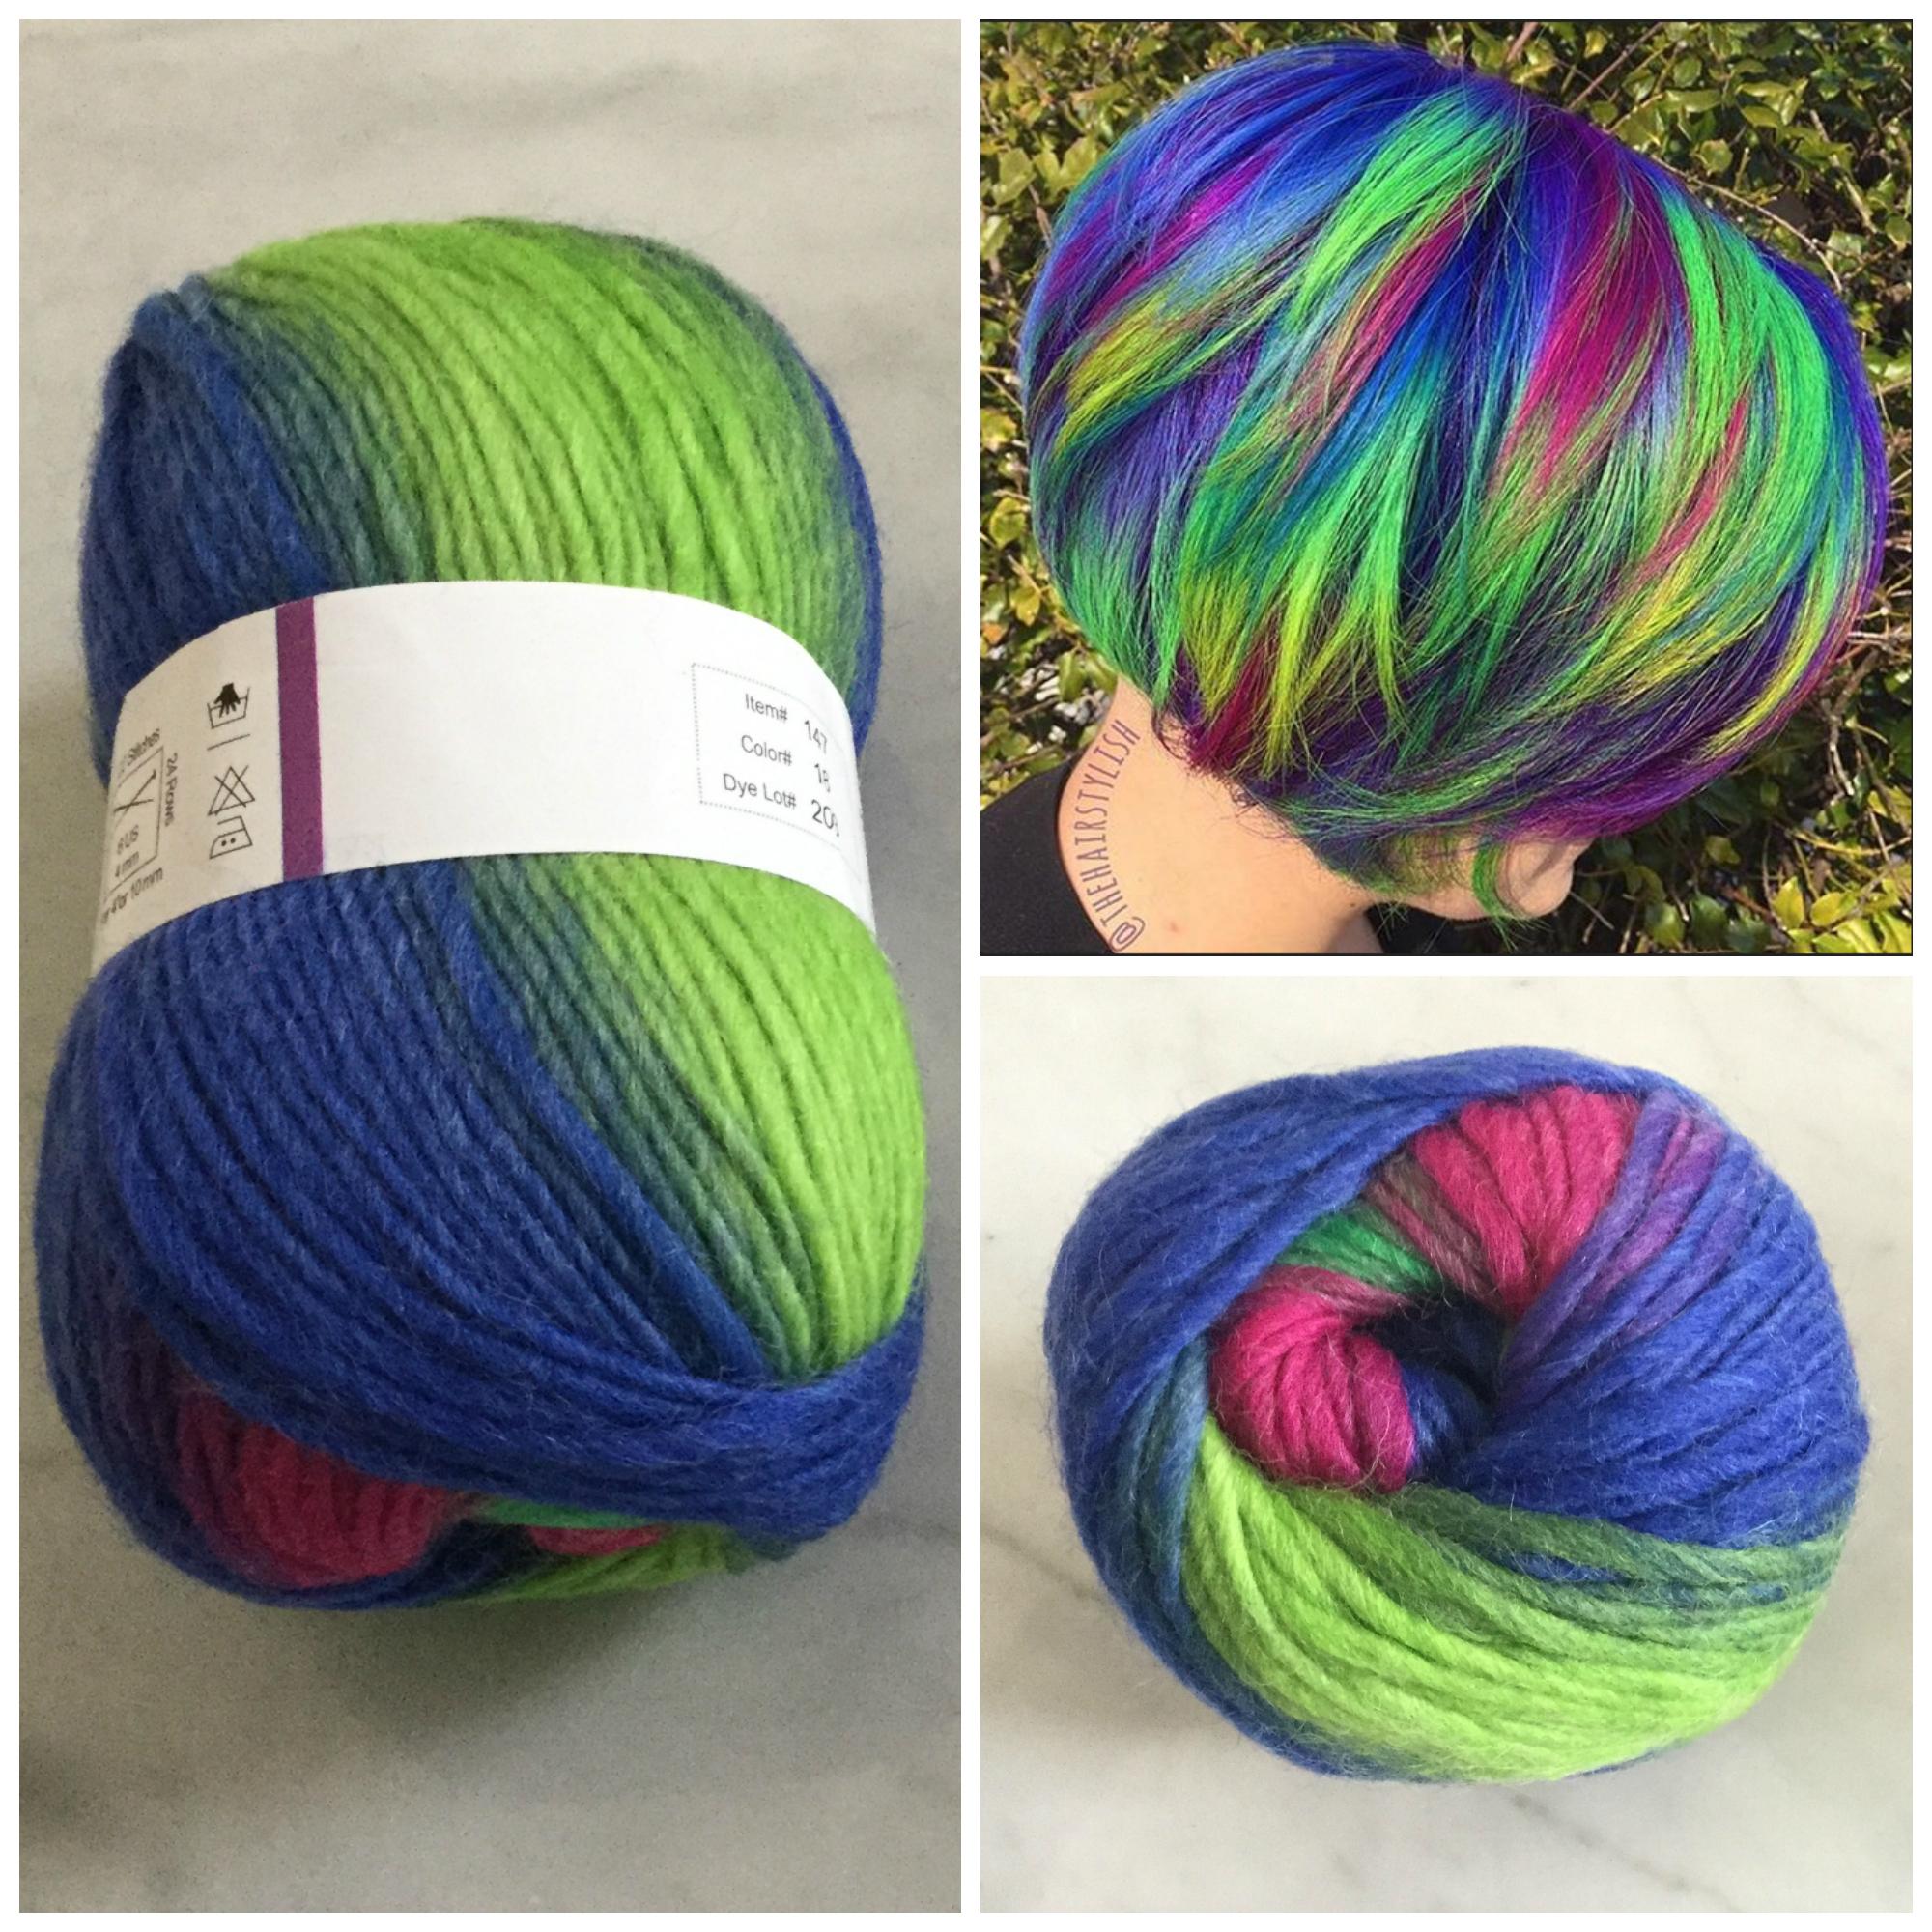 Magical Mermaid Hair ... Inspired by Yarn?